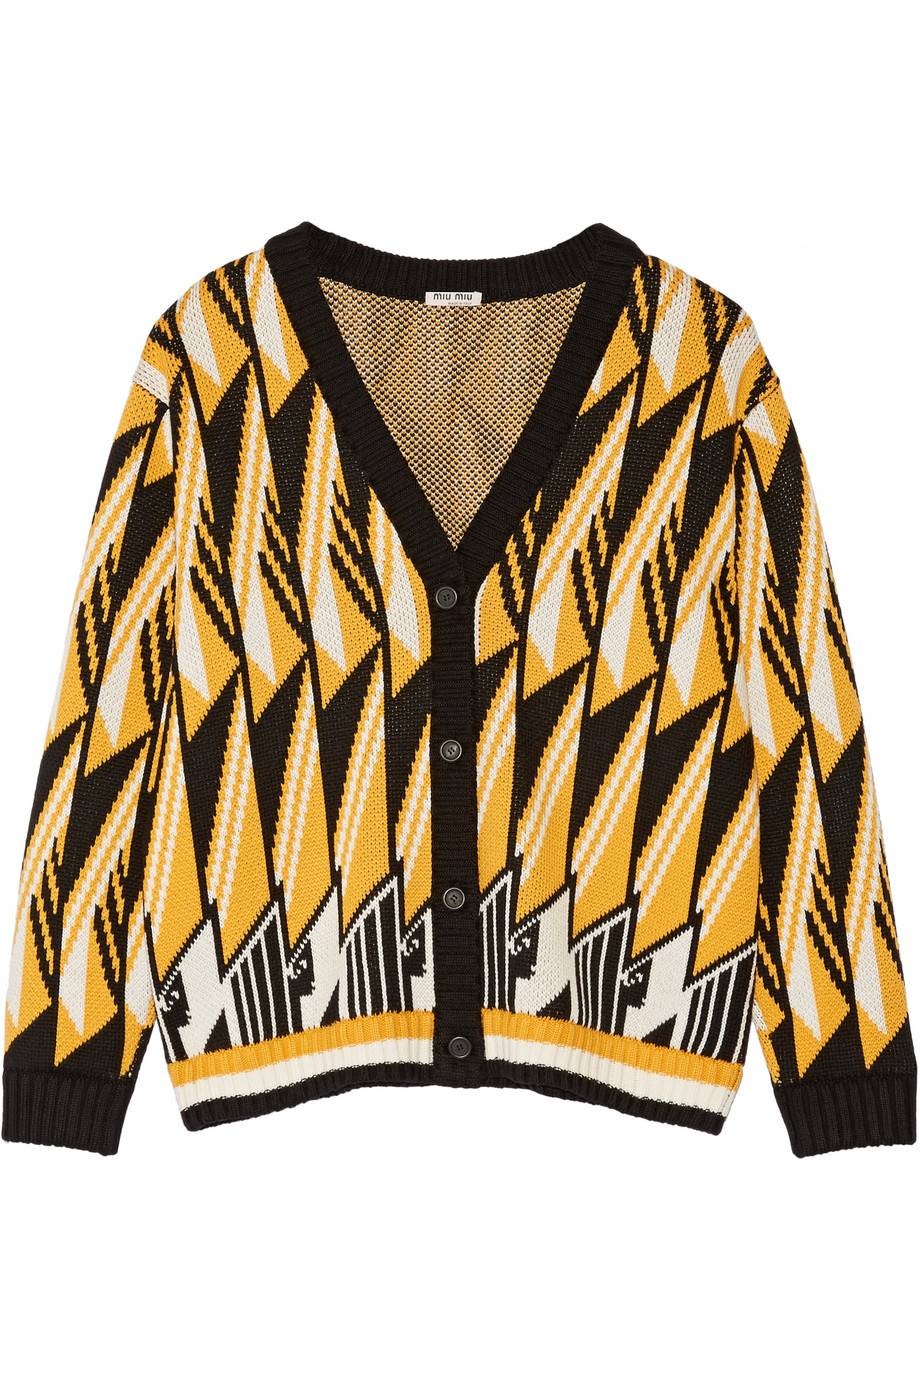 Miu Miu Oversized Wool-Jacquard Cardigan, Saffron, Women's, Size: 36